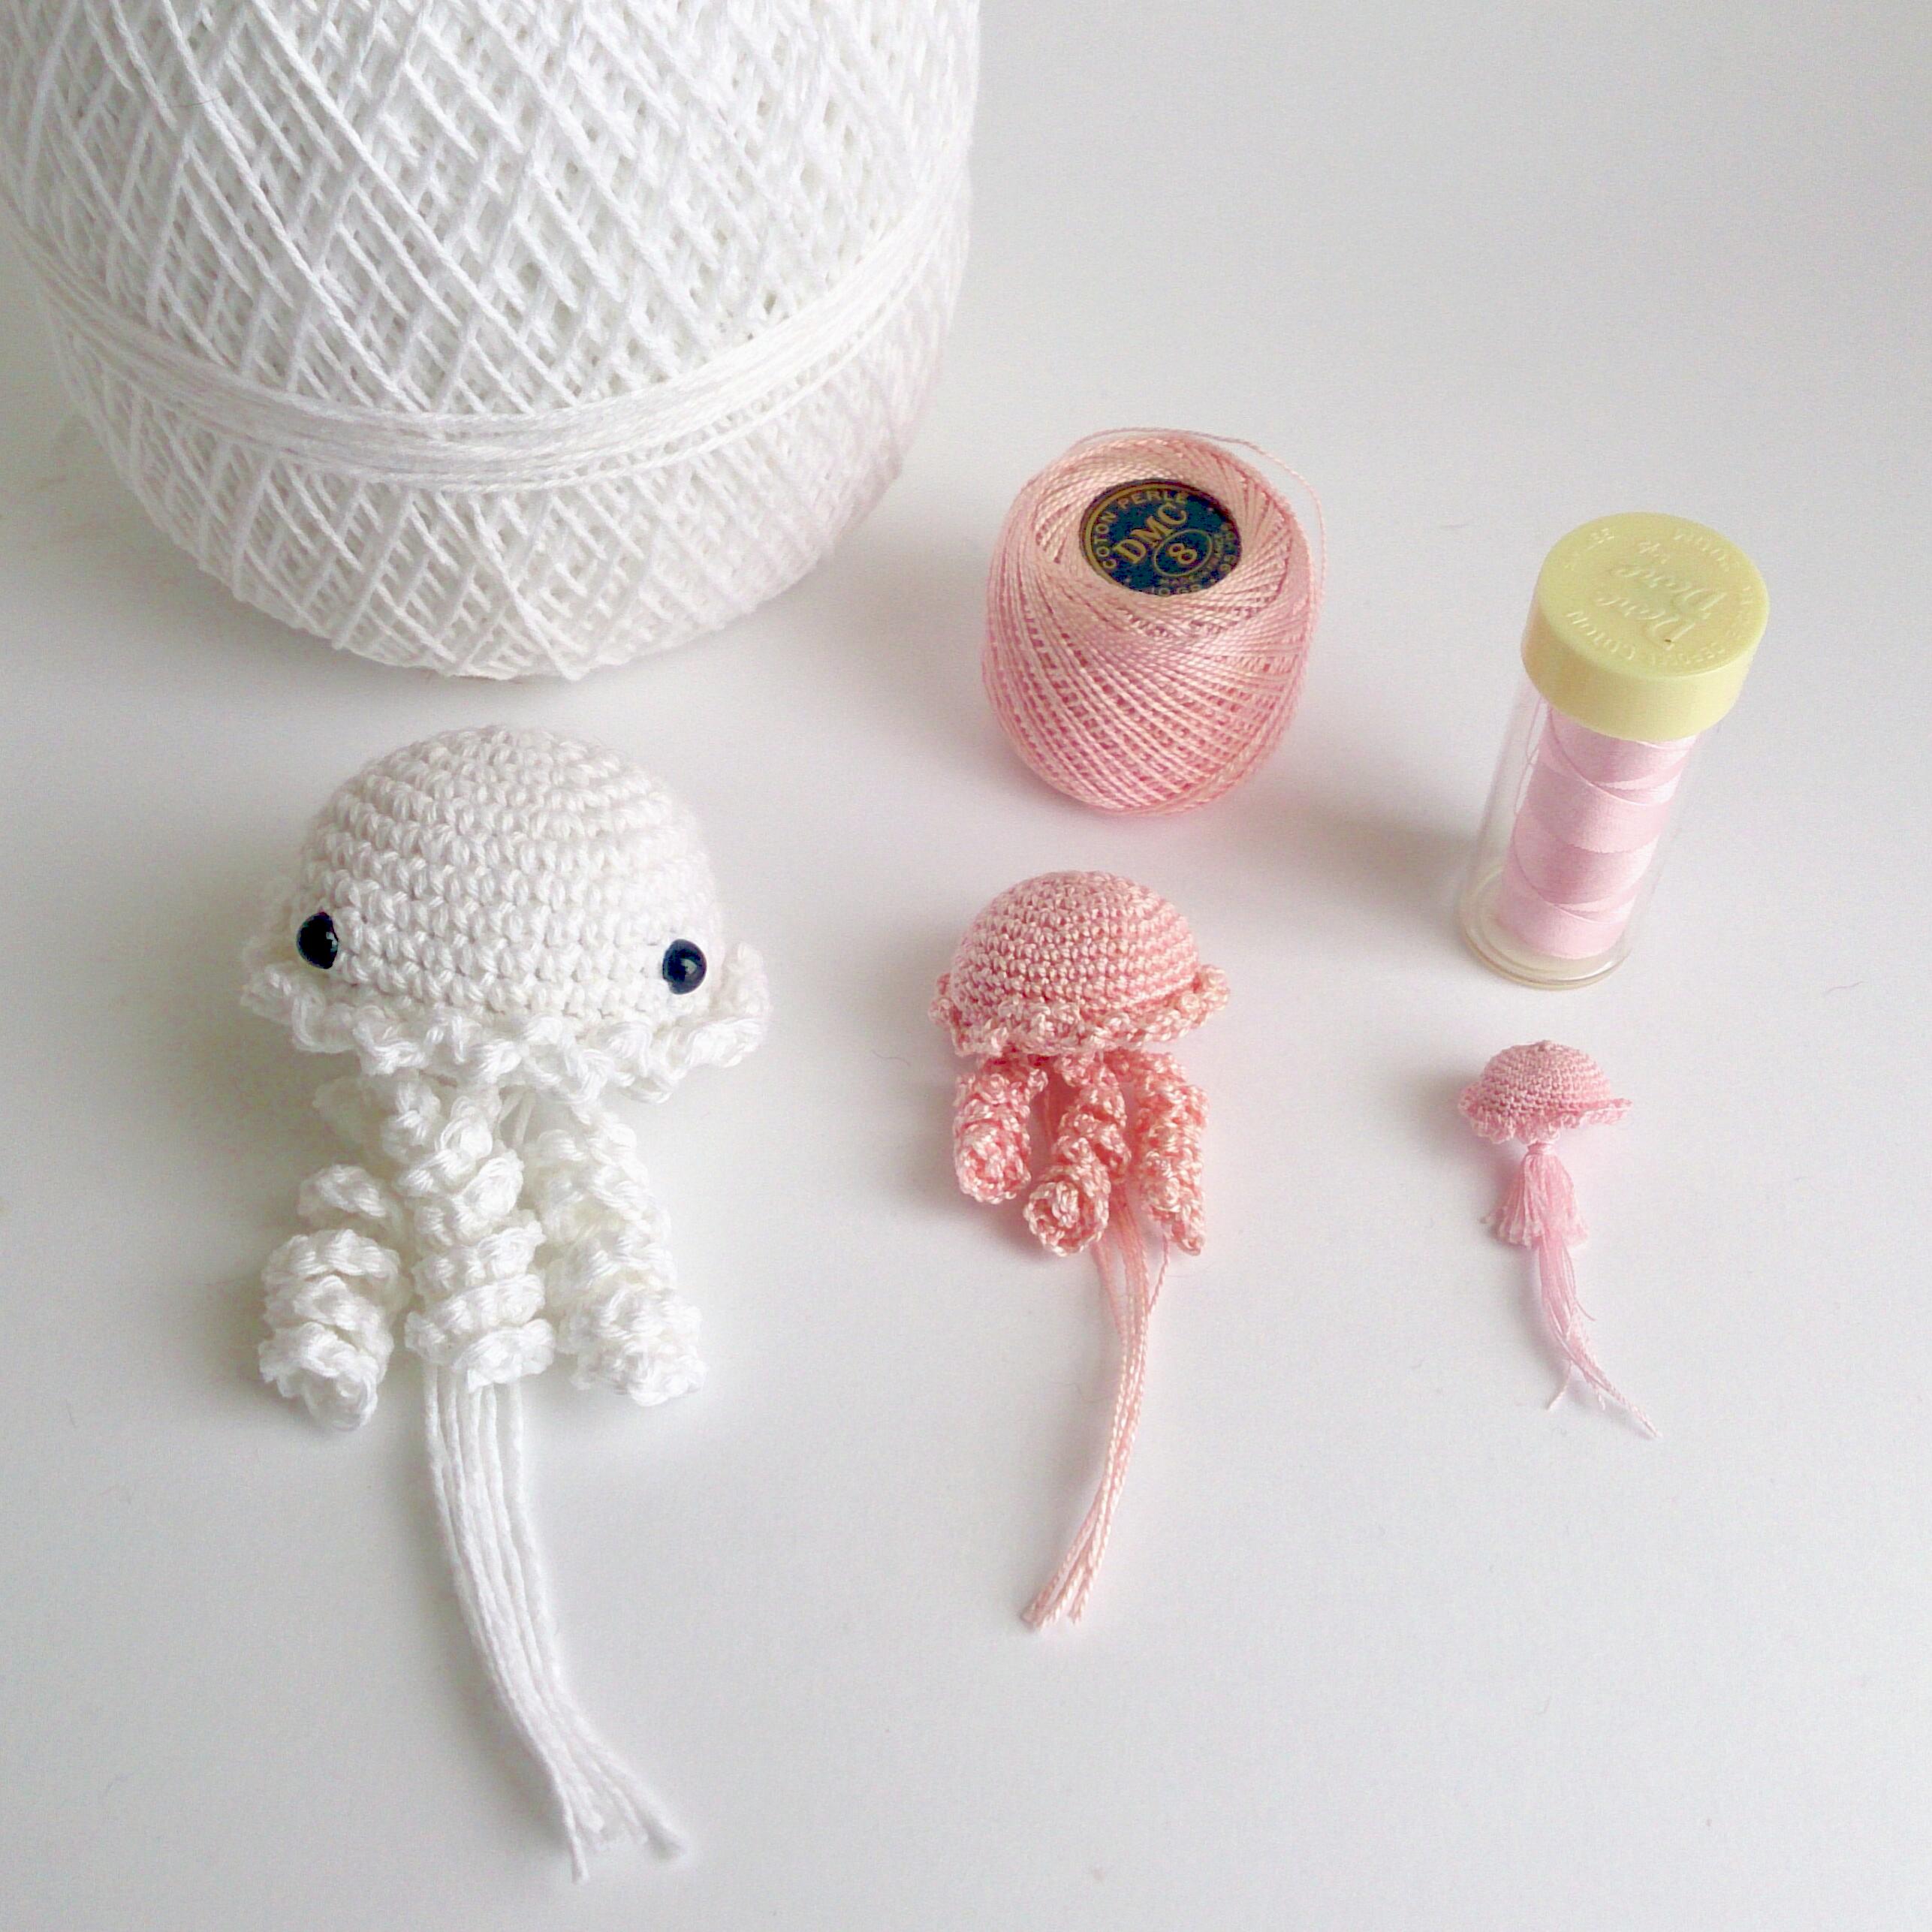 Jellyfishes - amigurumi crochet pattern by Armigurumi